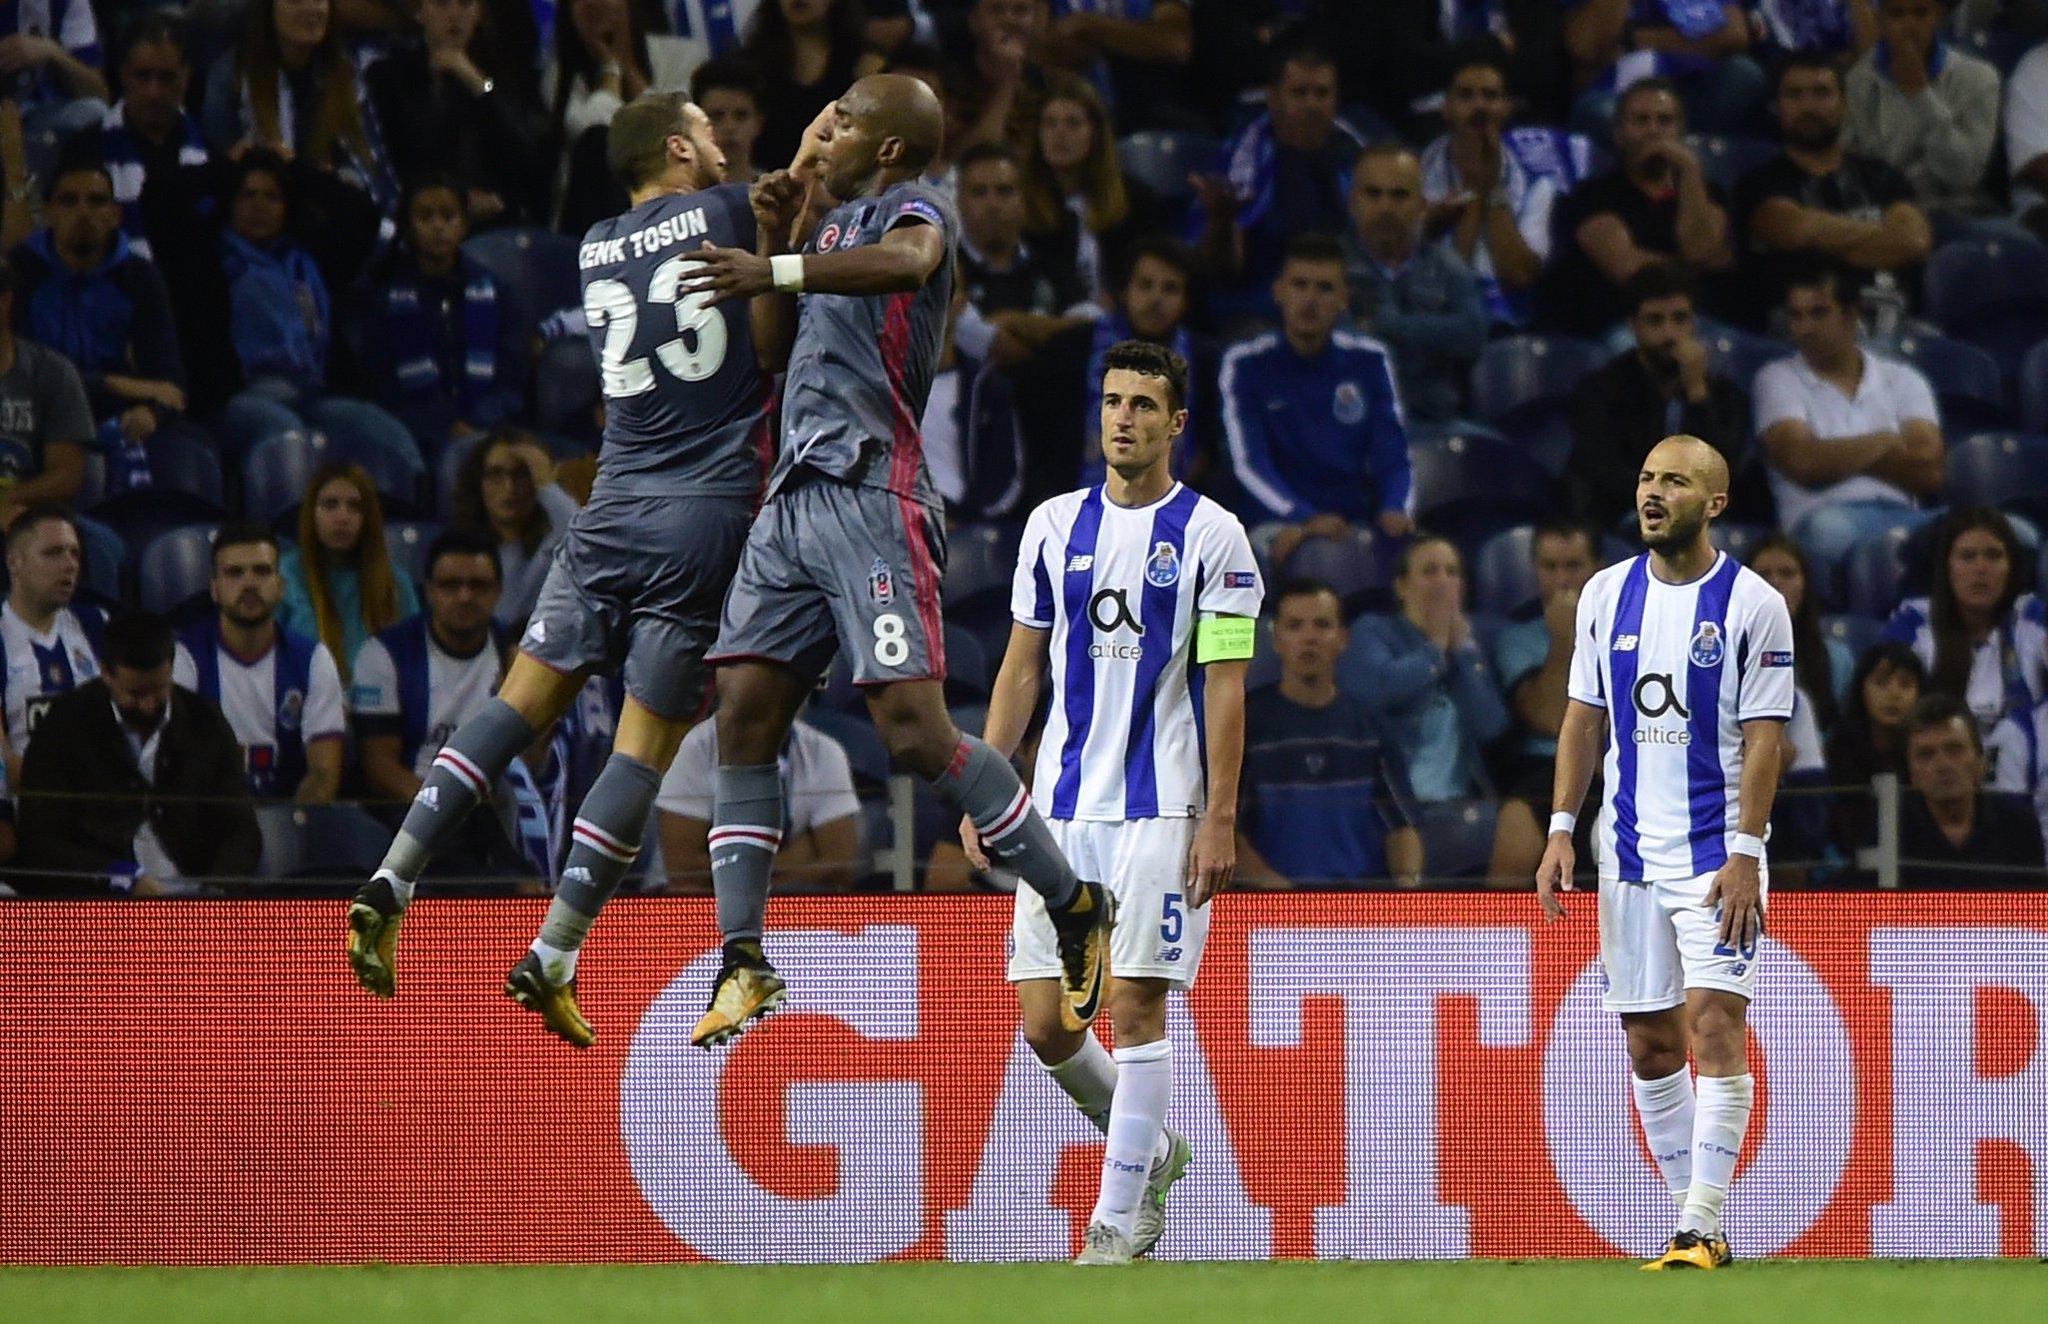 Jumping for joy!  Impressed by Beşiktaş goalscorers Cenk Tosun & Ryan Babel tonight? �� #UCL https://t.co/VkjycDrFiY